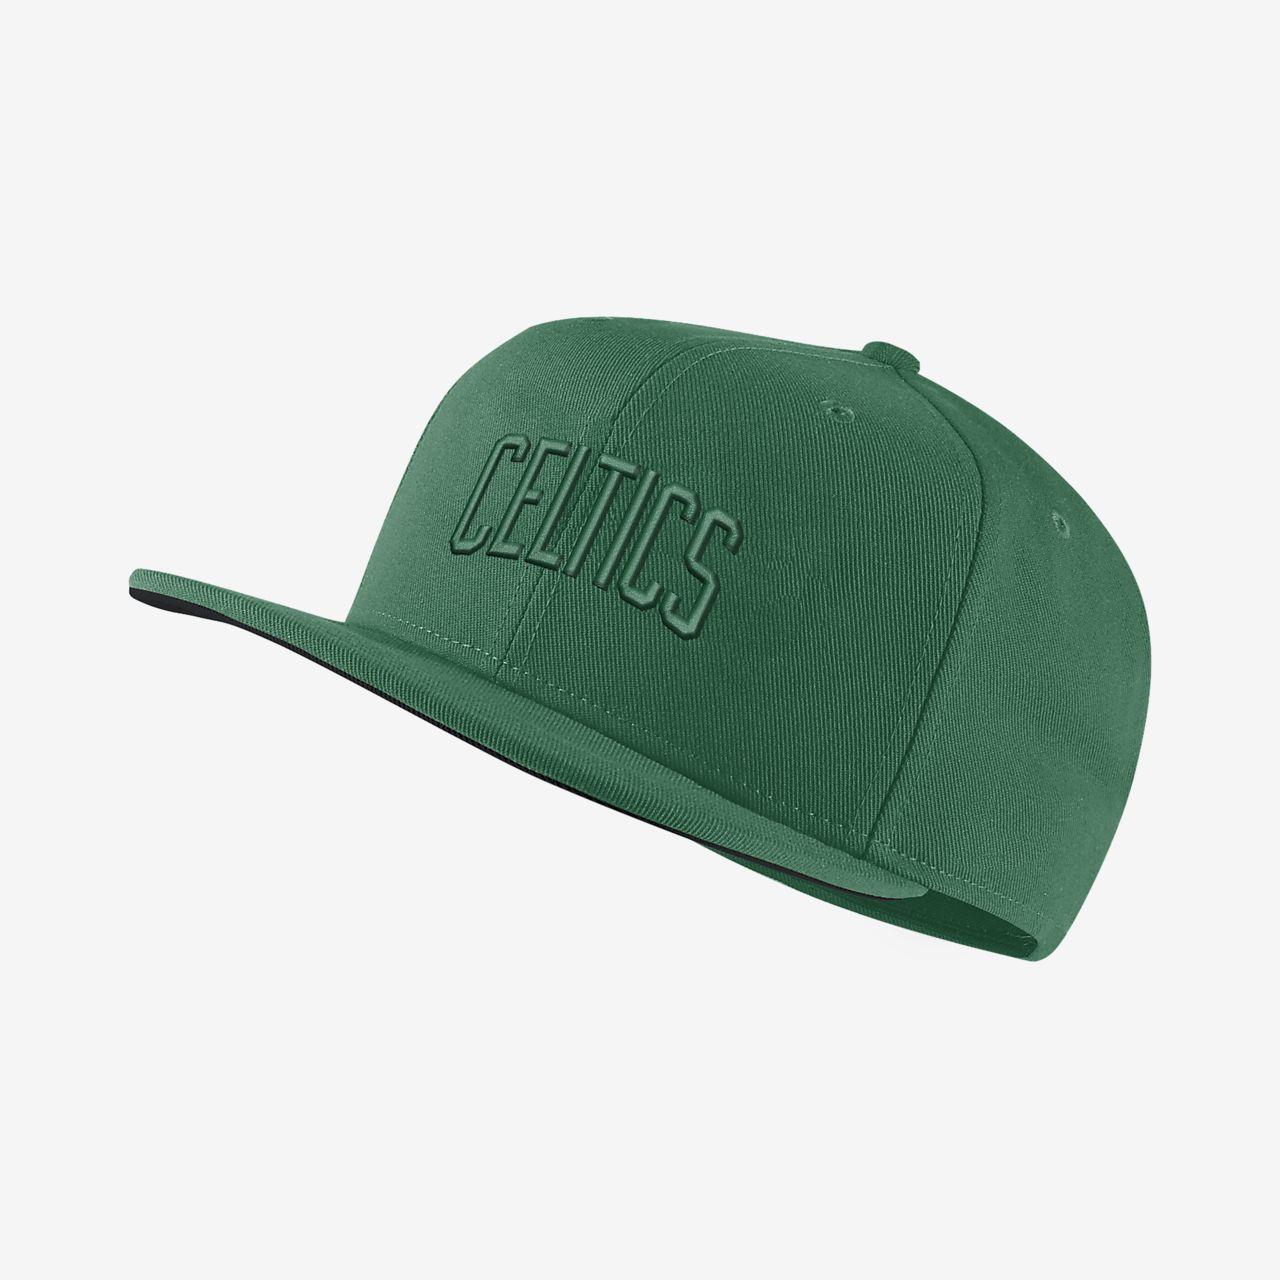 Boston Celtics Nike AeroBill NBA-s sapka